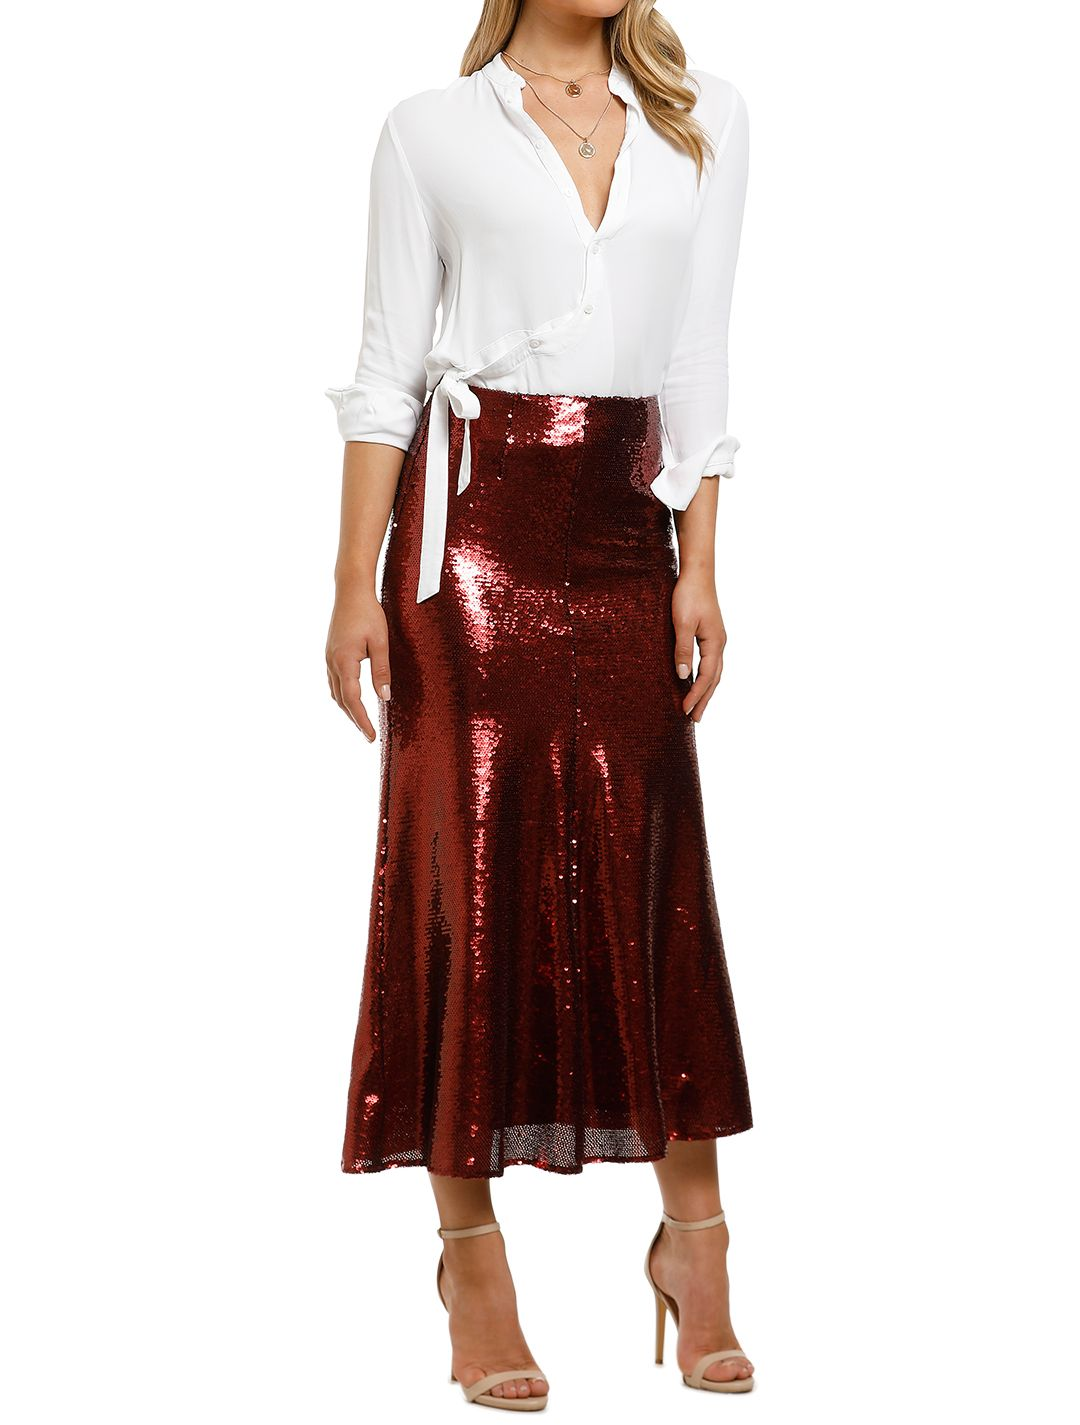 Keepsake-the-Label-Farewell Skirt-Ruby-Side